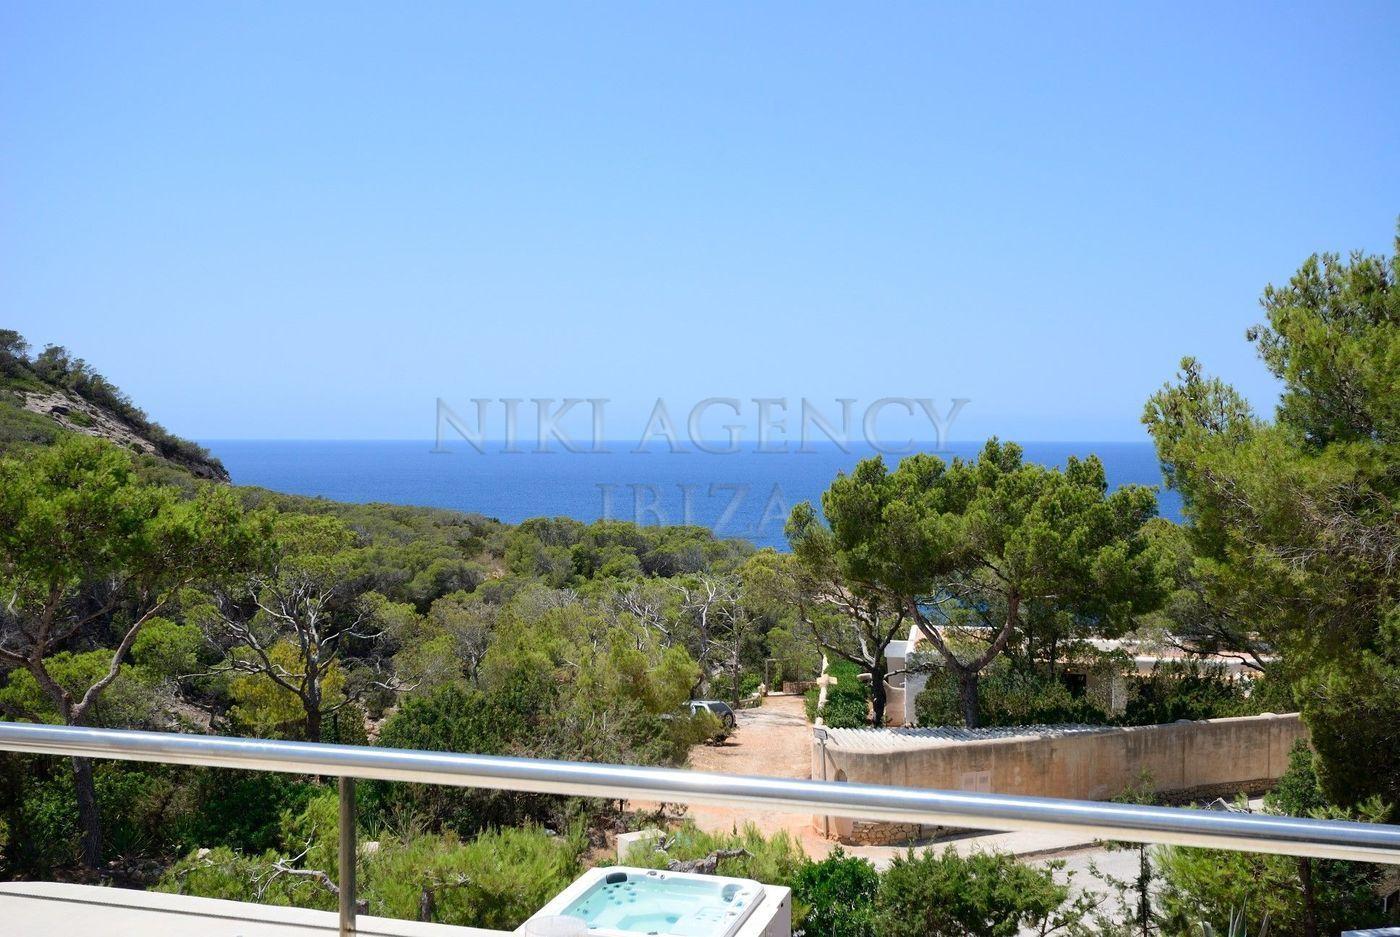 17. House for sale in Sant Josep de sa Talaia Ibiza - Fantastic 4 Bed Villa For Sale in Sant Josep de sa Talaia, Ibiza!